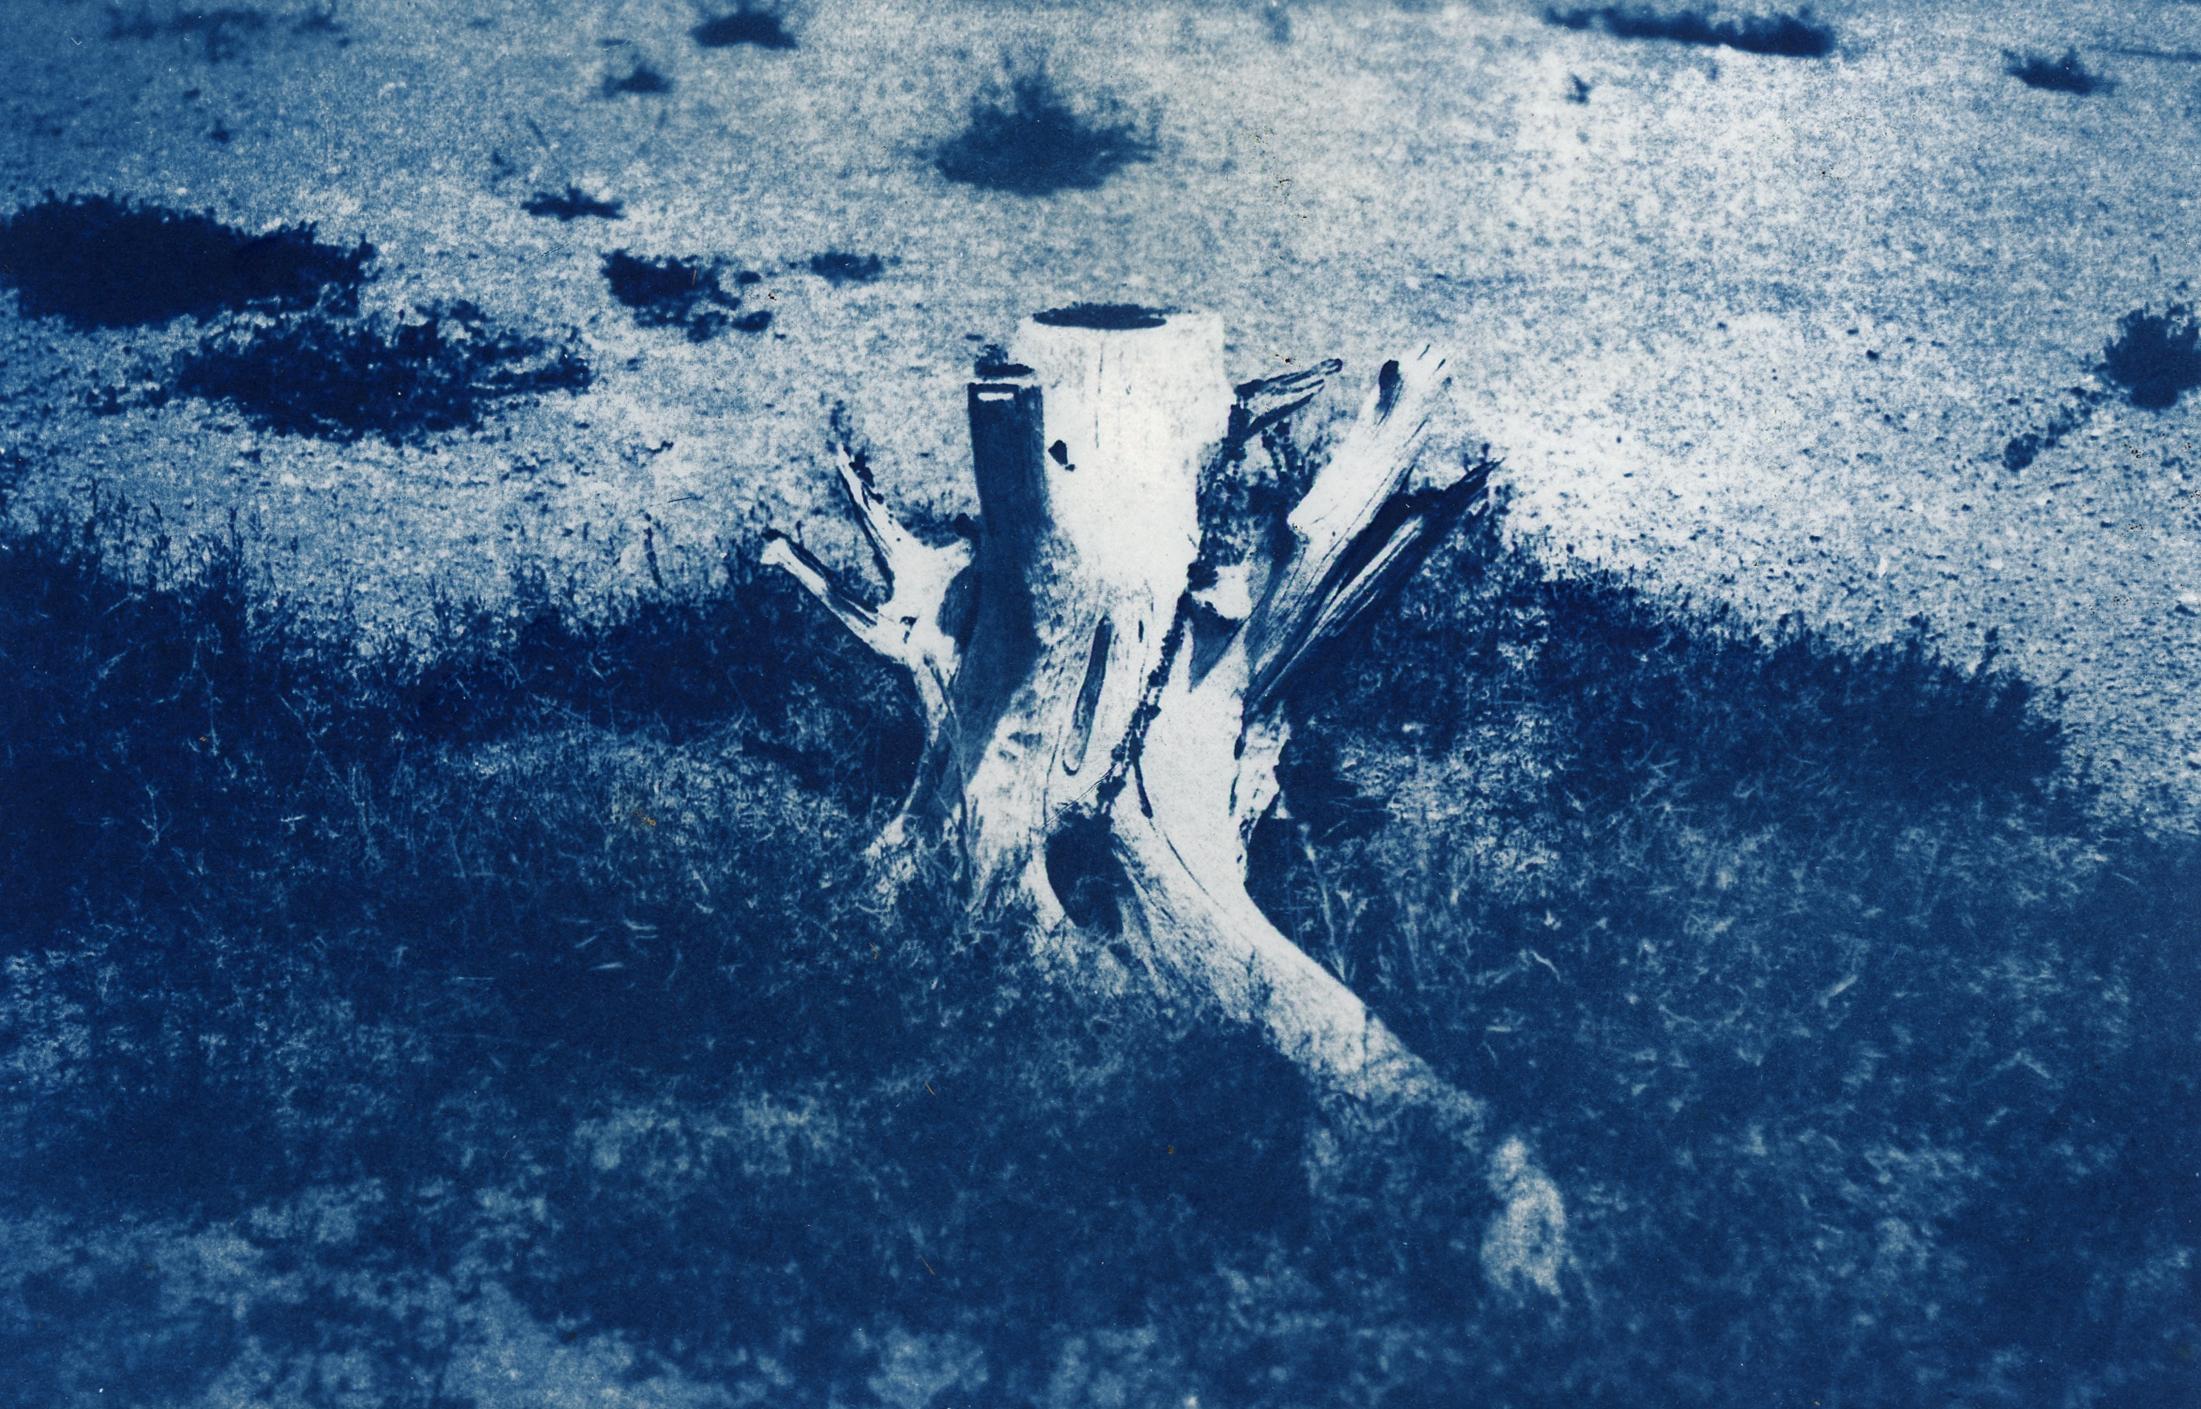 stump1.jpg